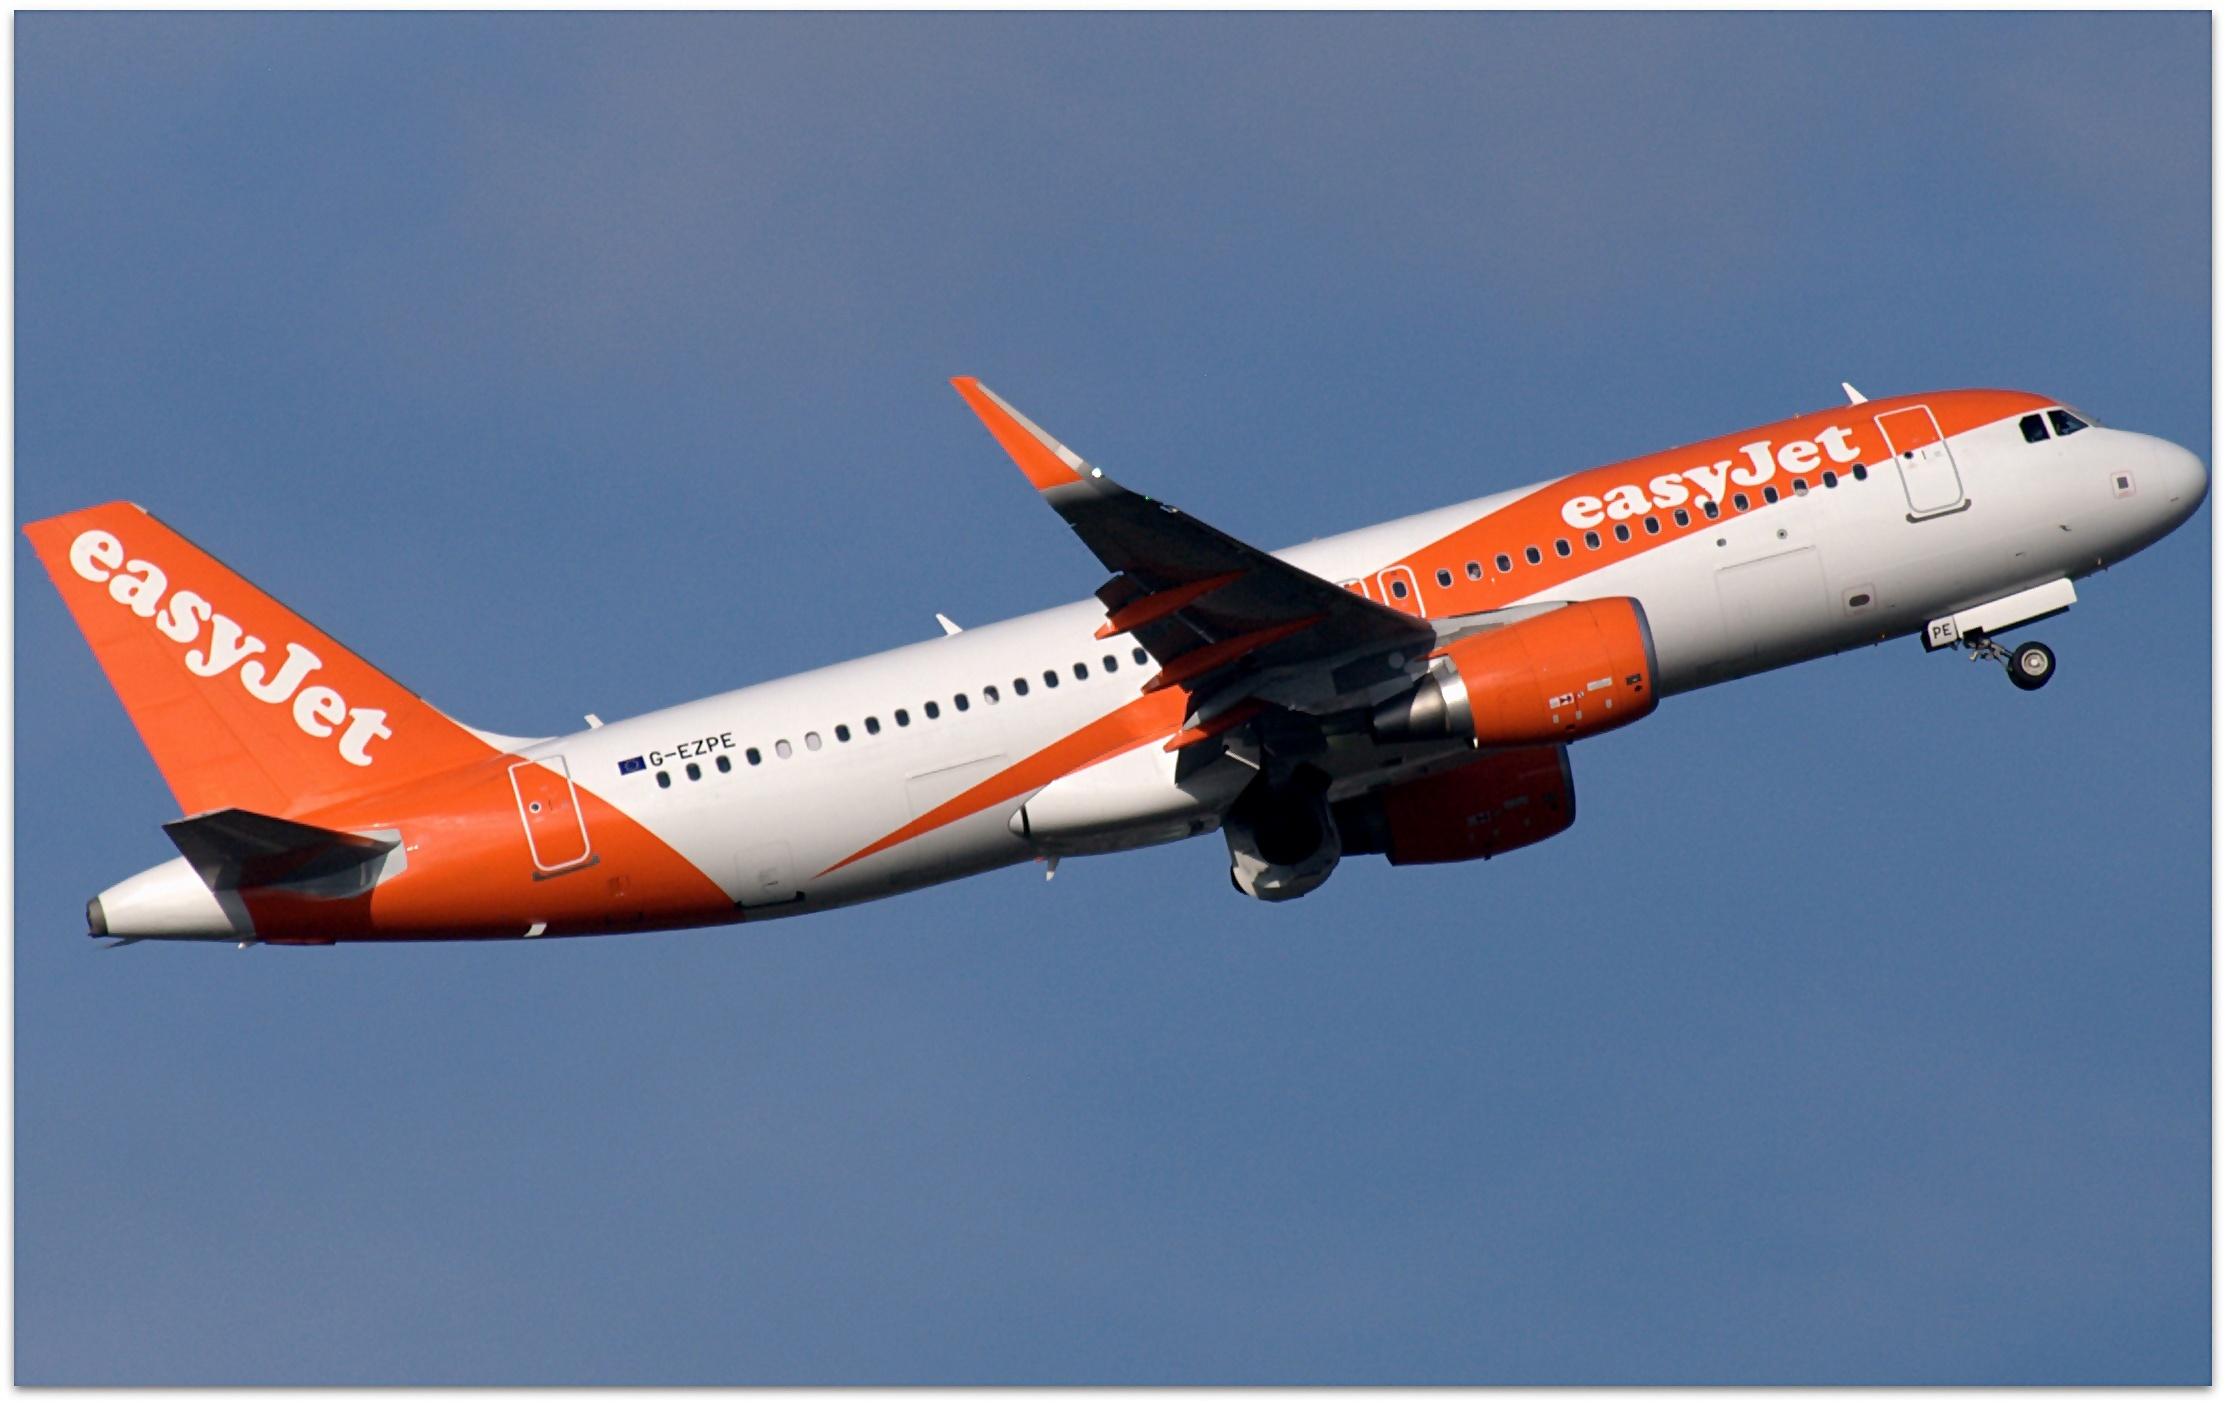 Wallpaper : manchester, airport, egcc, gezpe, airplane, jet